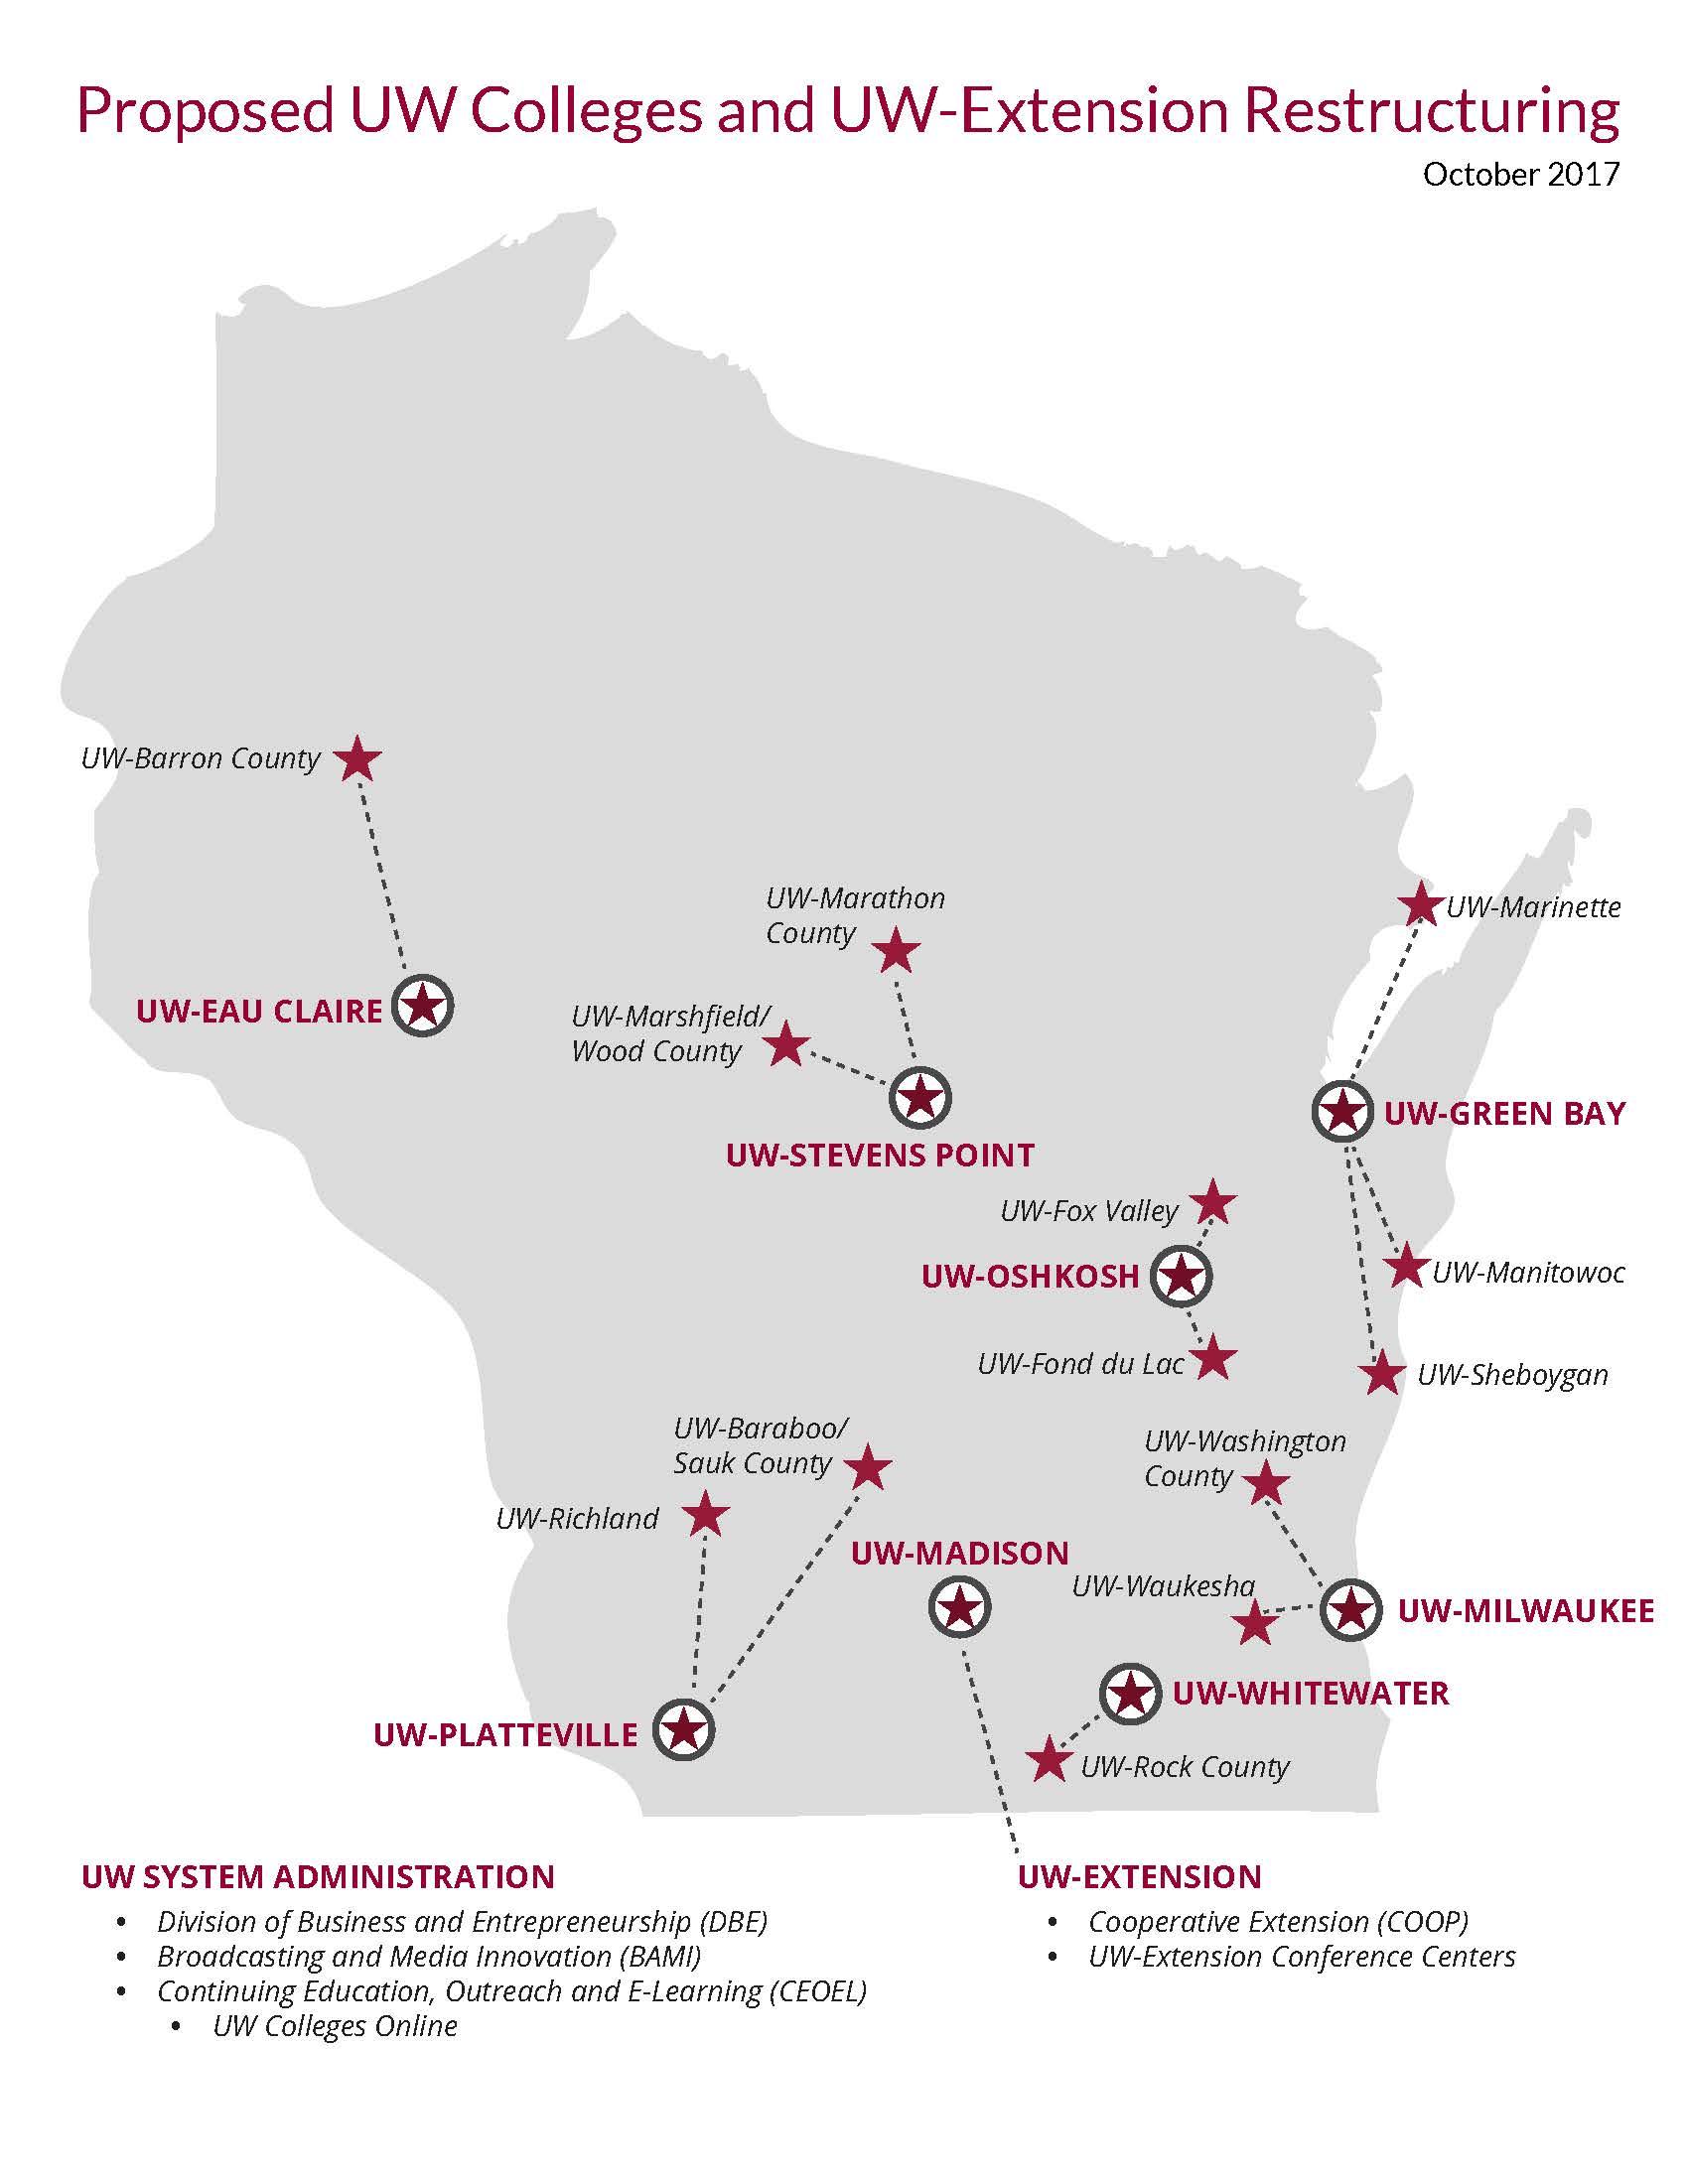 UW Regents Approve Merging System Campuses | Wisconsin Public Radio